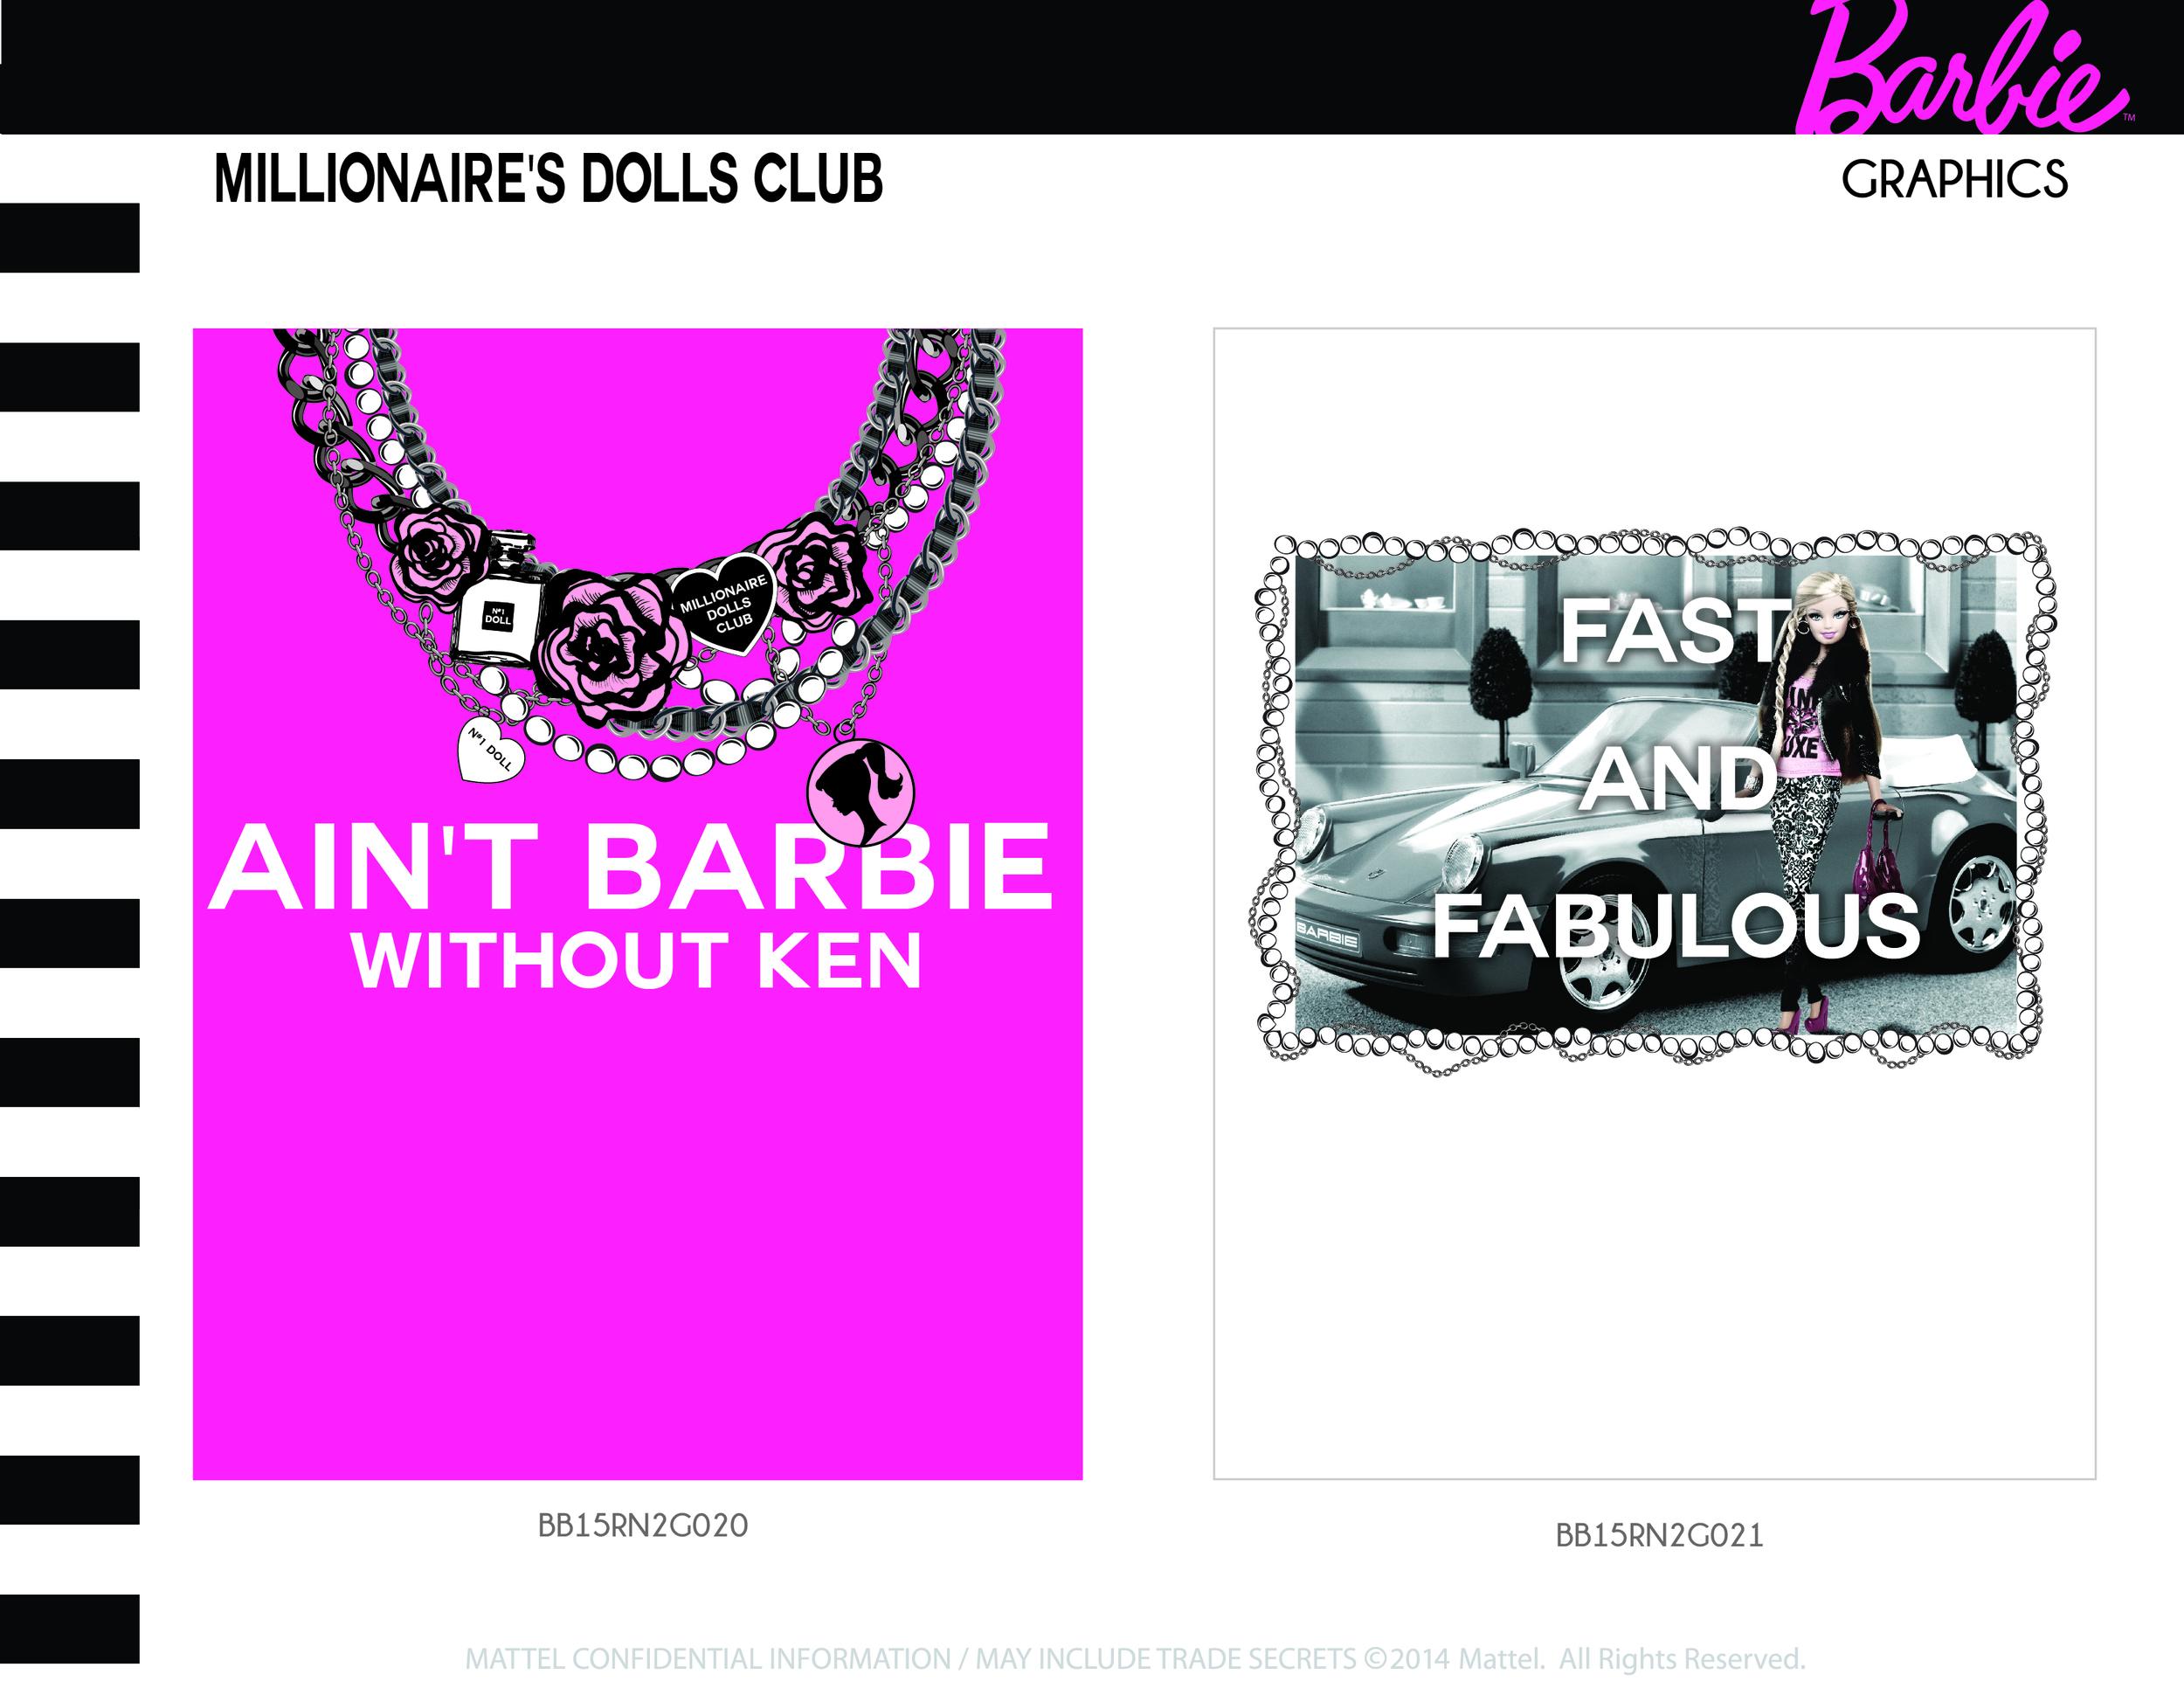 Millionaire's Dolls Club Graphics 7-8